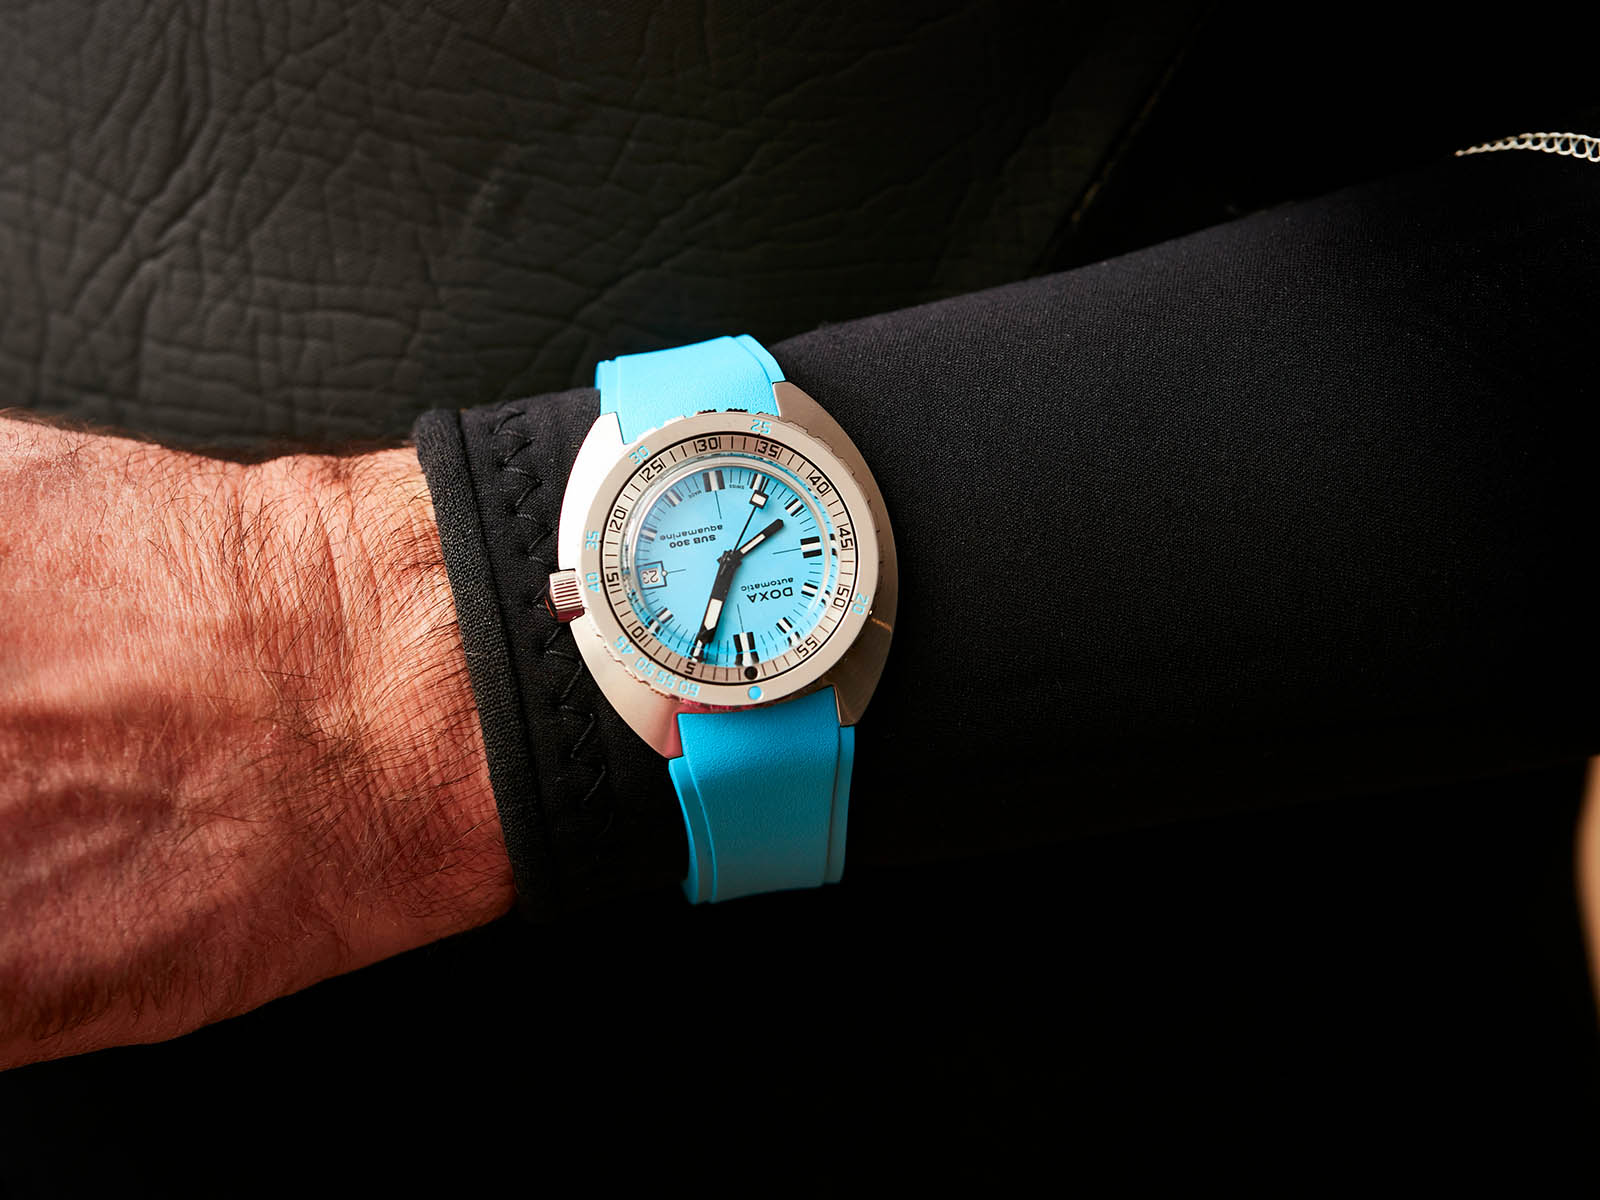 821-10-241-25-doxa-sub300-aquamarine-3.jpg